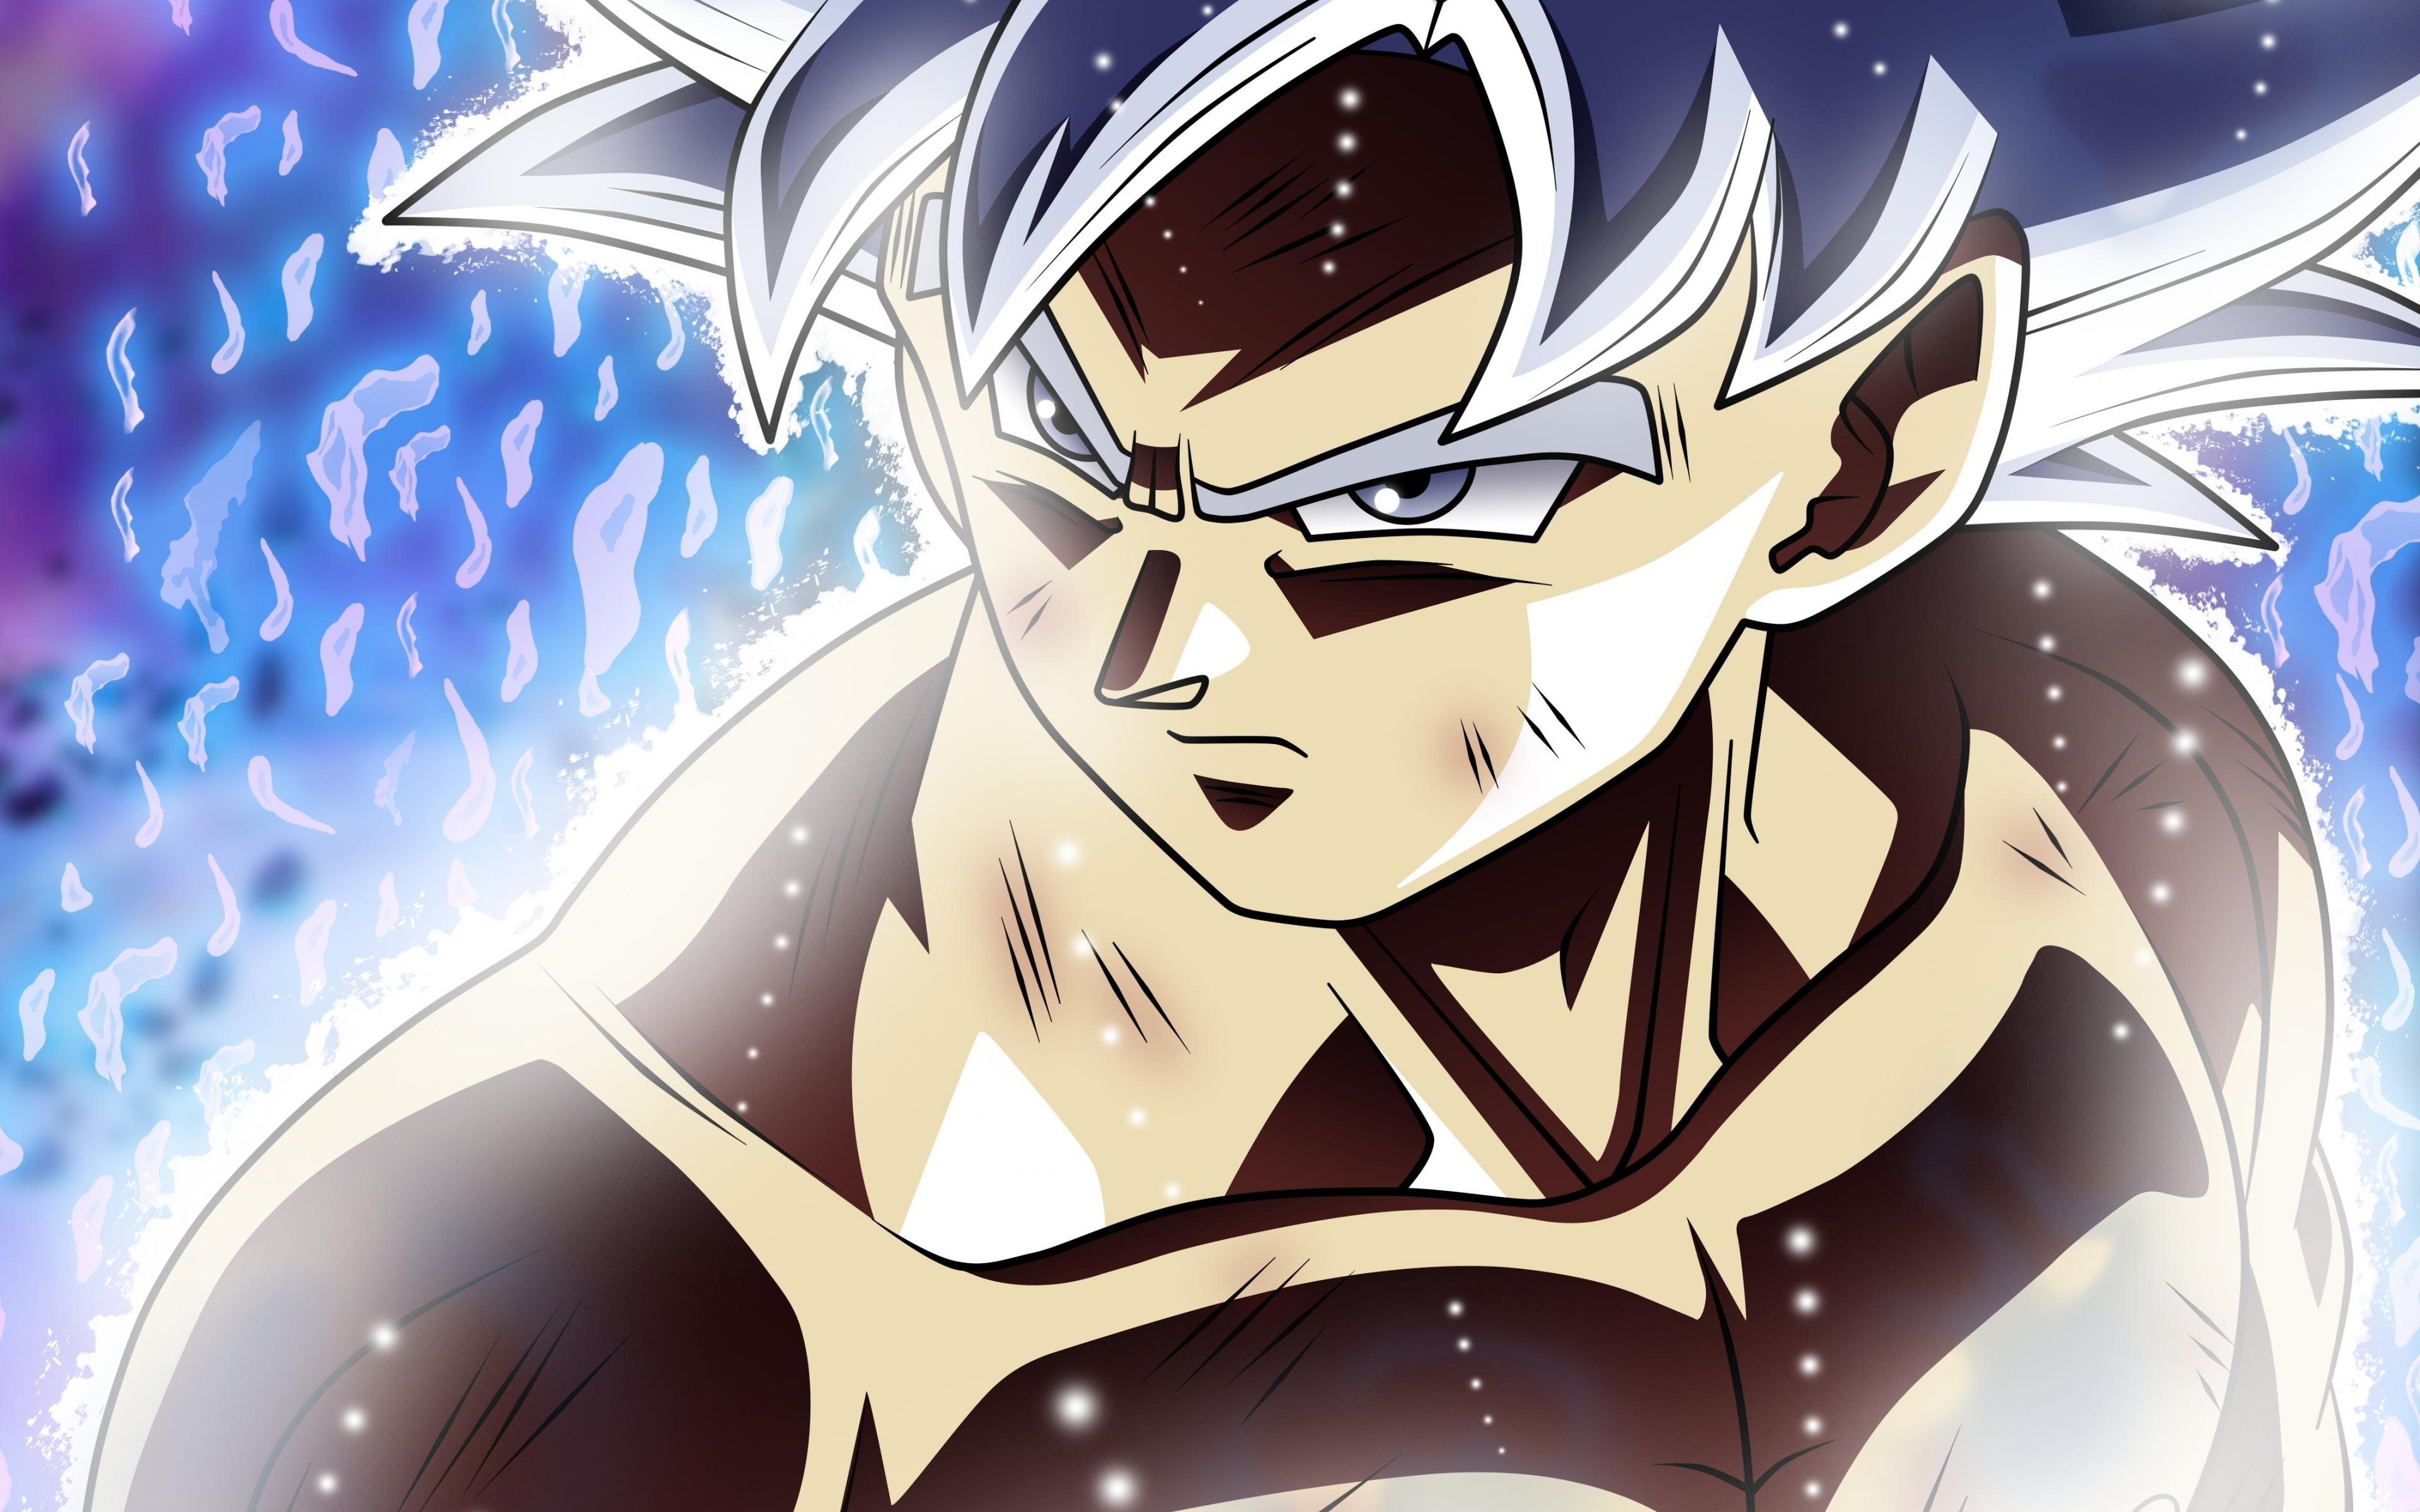 Download 3840x2400 Wallpaper Goku Dragon Ball Super Ultra